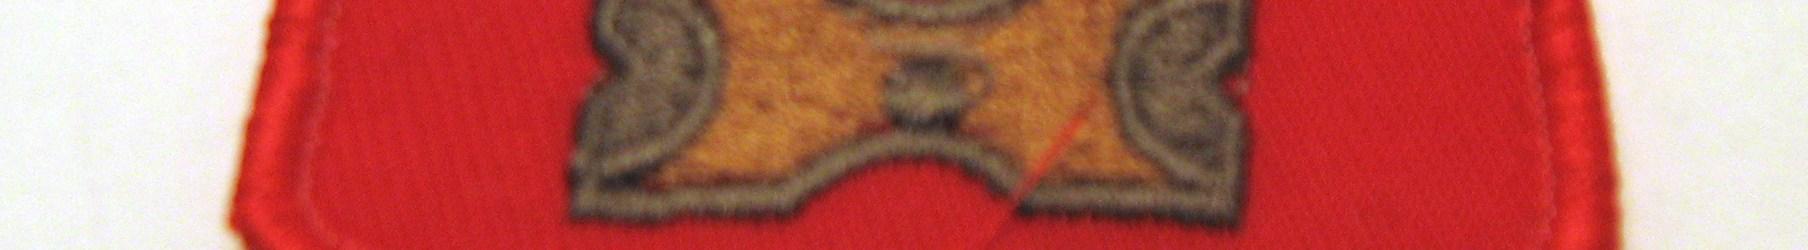 Badge de formateur – Conseiller